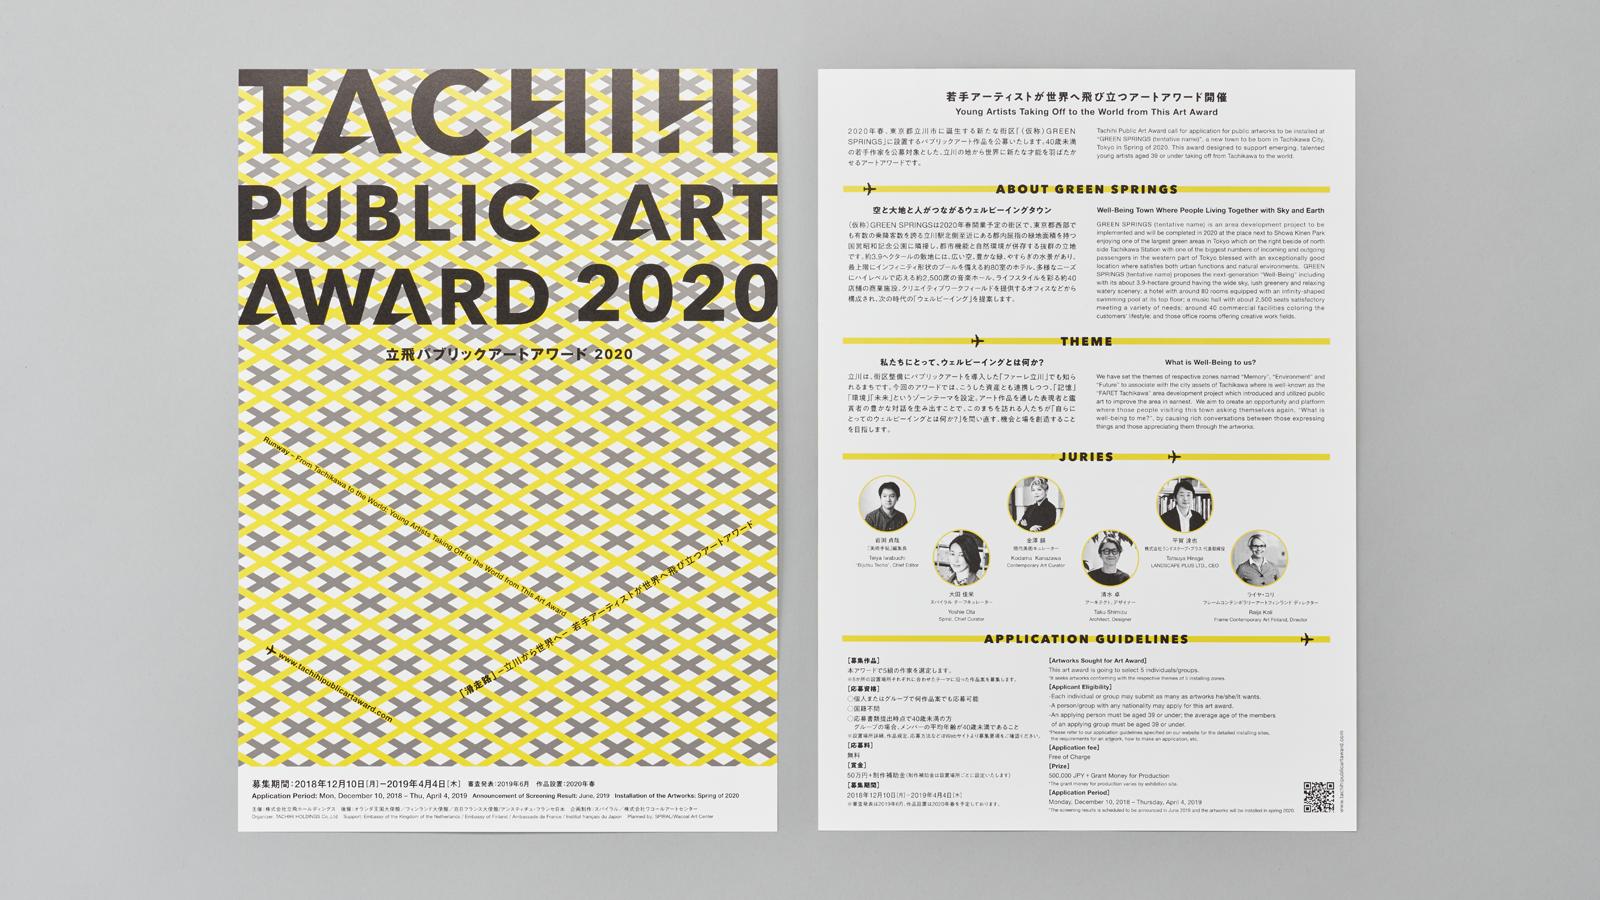 TACHIHI PUBLIC ART AWARD 2020